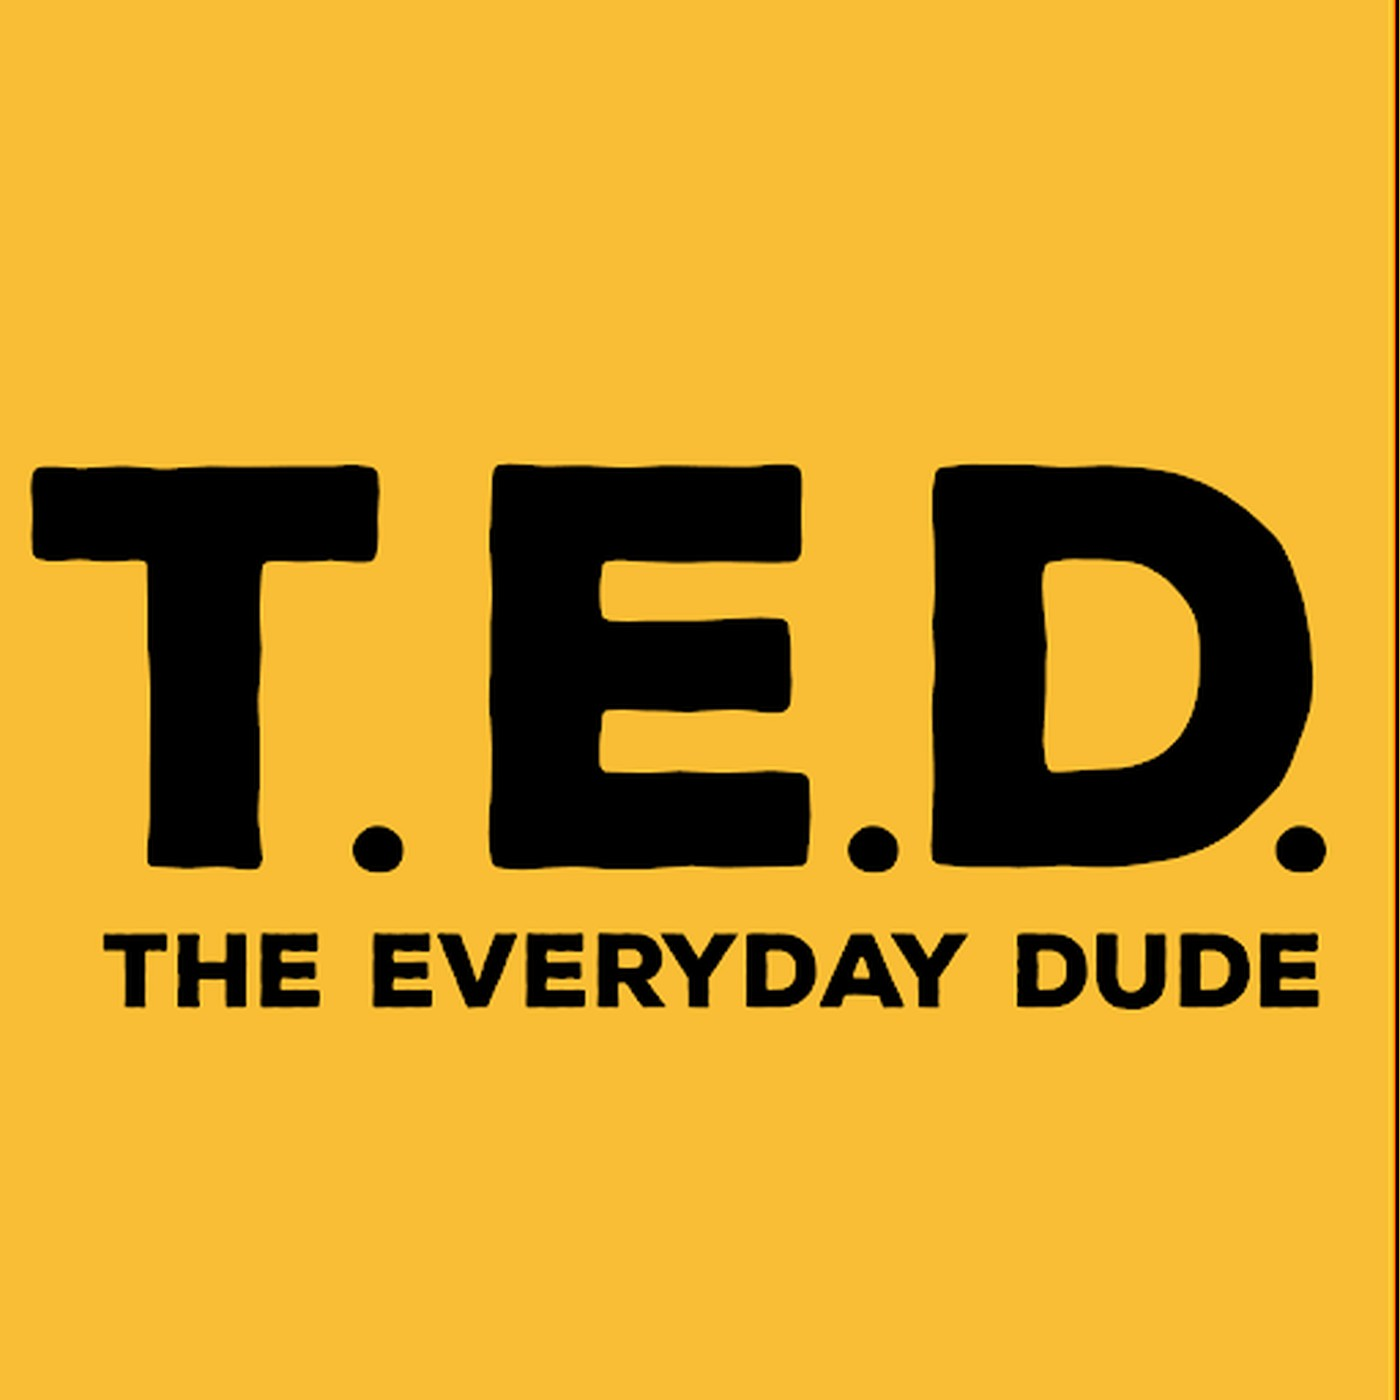 The Everyday Dude